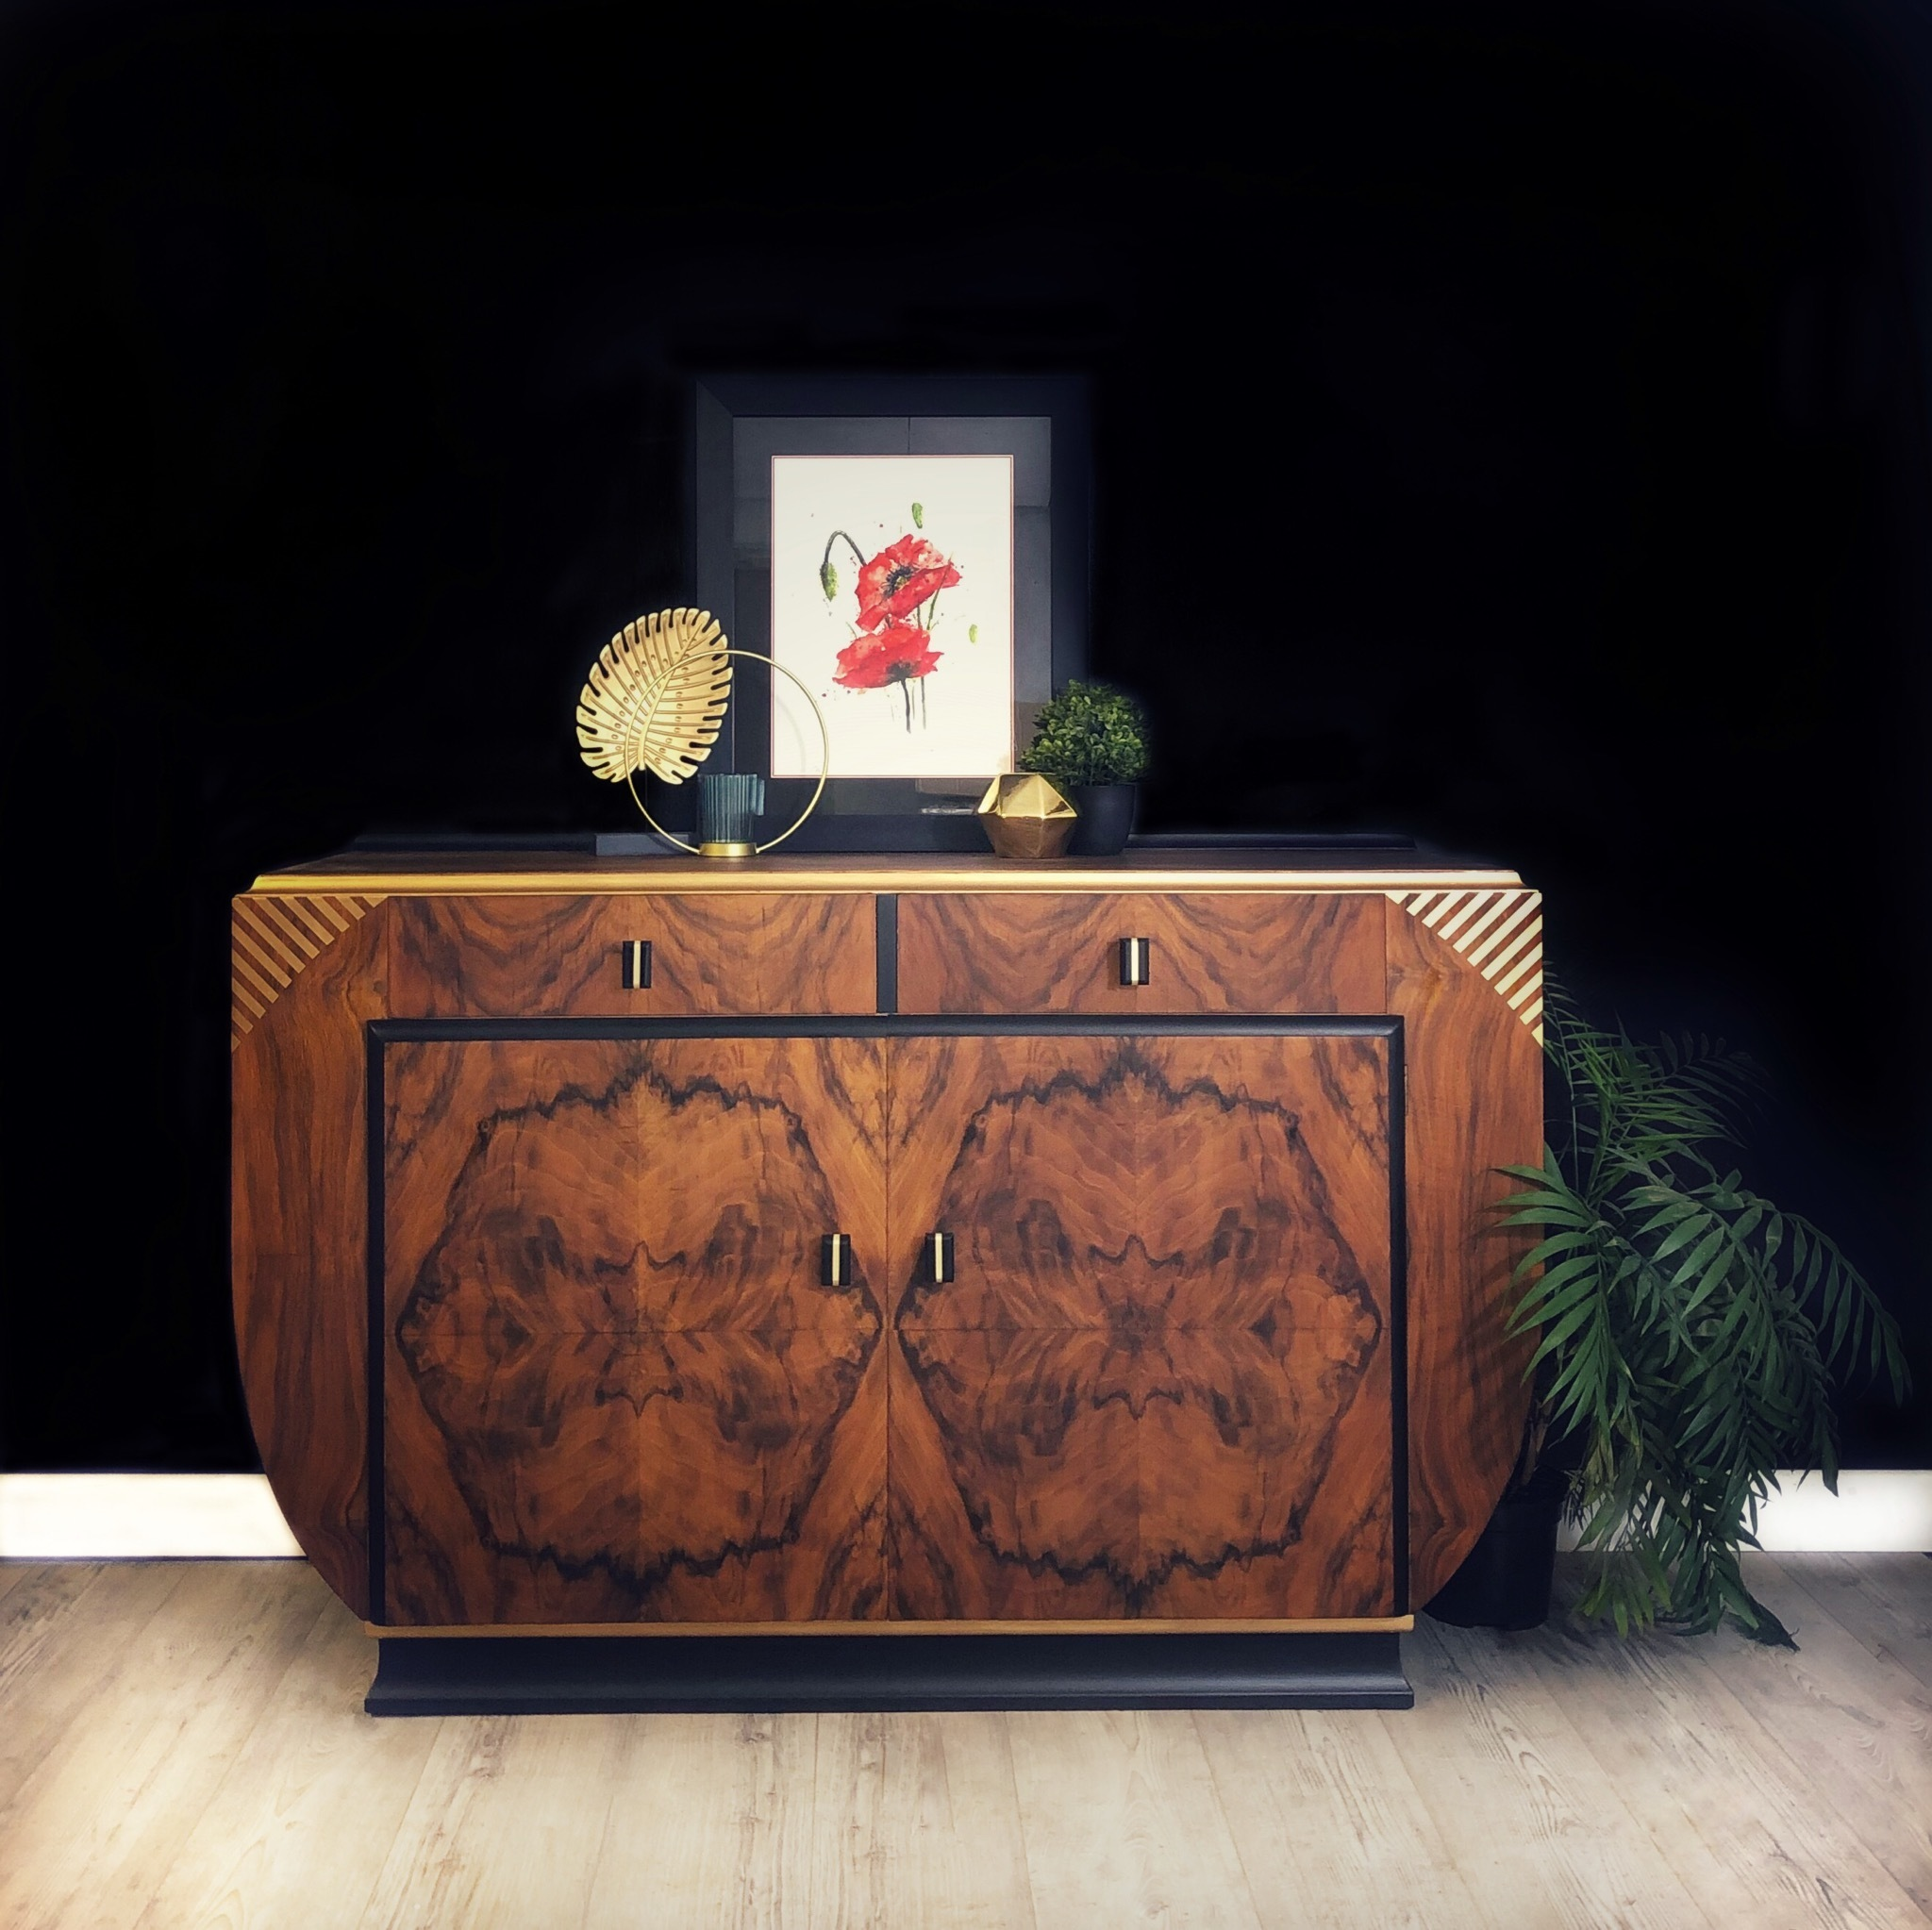 Art Deco Sideboard Art Deco Drinks Cabinet Burr Walnut Black And Gold Buffet Server Retro Cocktail Cabinet Grant Vinterior